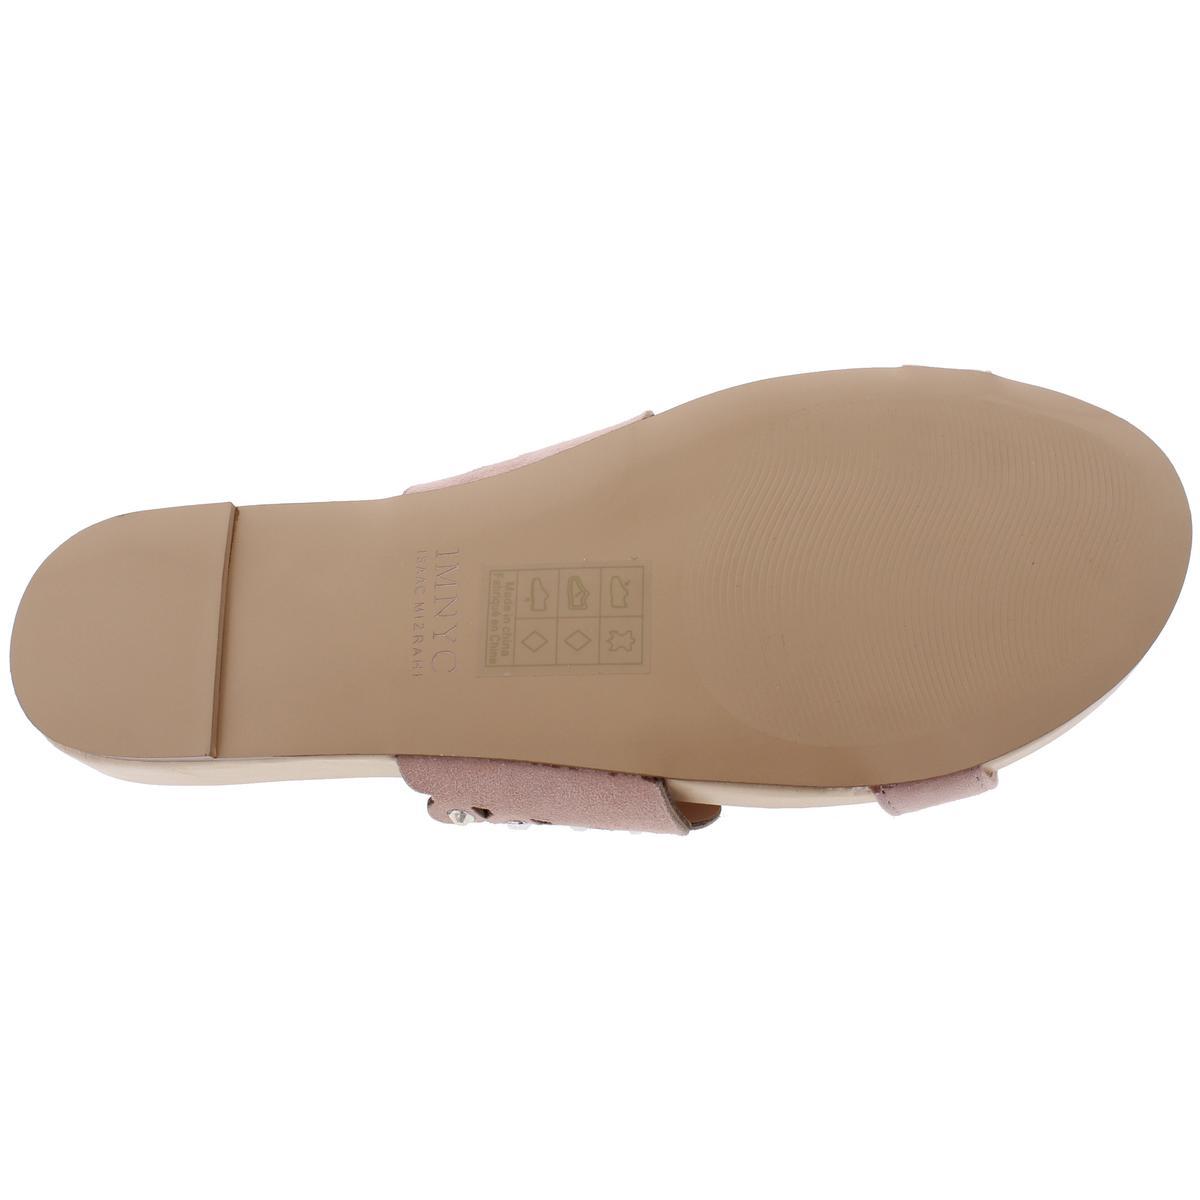 IMNYC-Isaac-Mizrahi-Womens-Suzie-Open-Toe-Studded-Slide-Sandals-Shoes-BHFO-2715 thumbnail 12